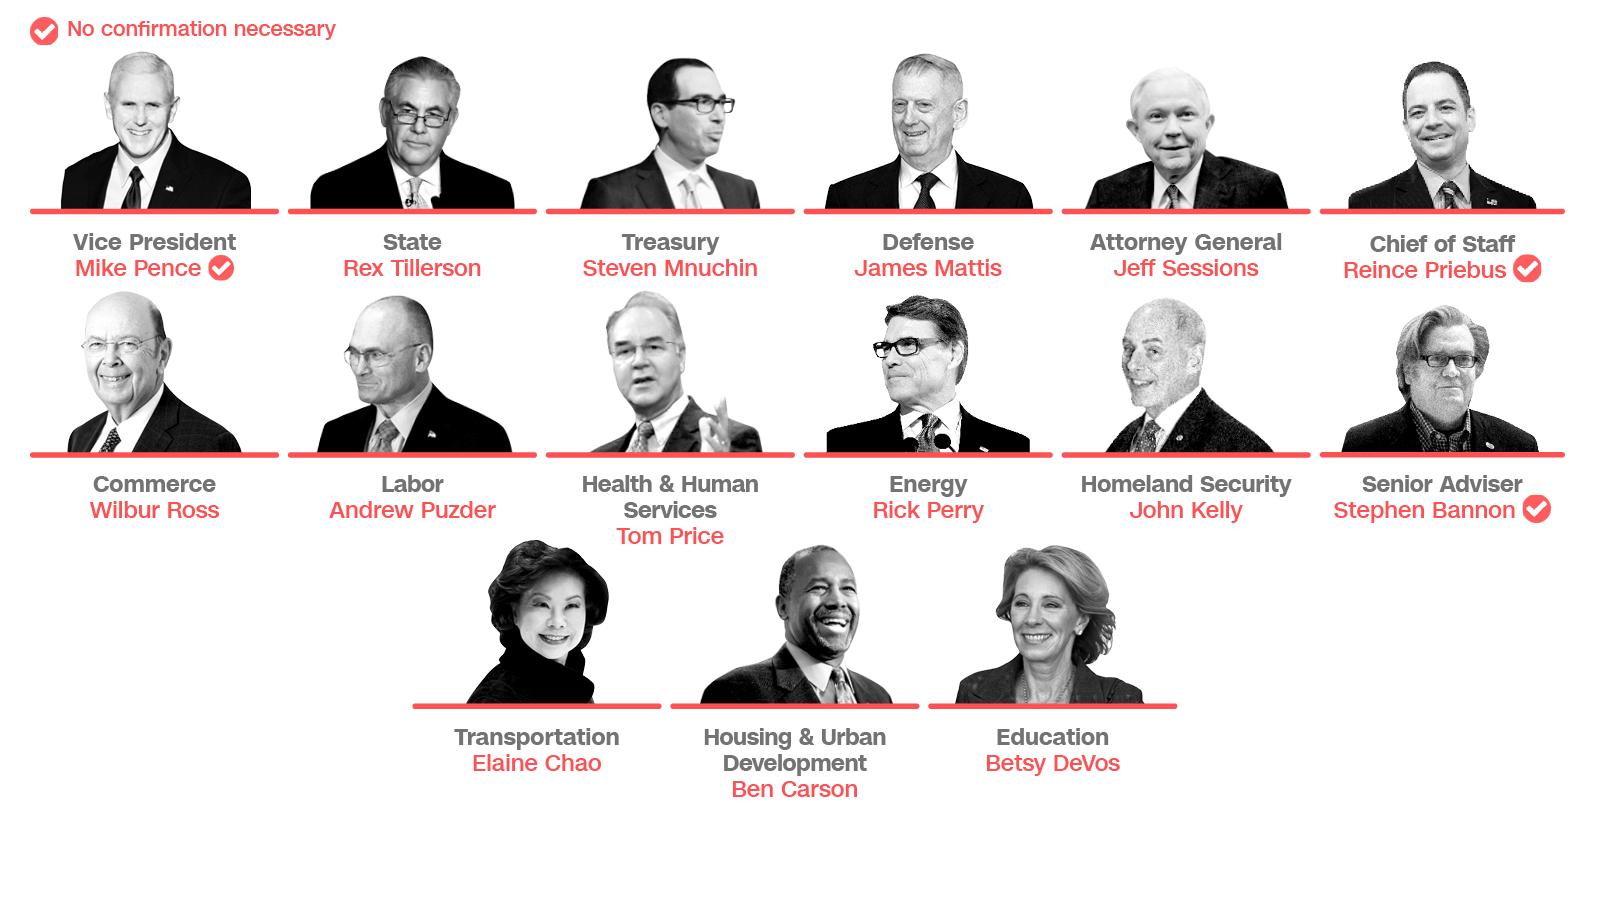 White Males Dominate Donald Trumpu0027s Top Cabinet Posts   CNNPolitics